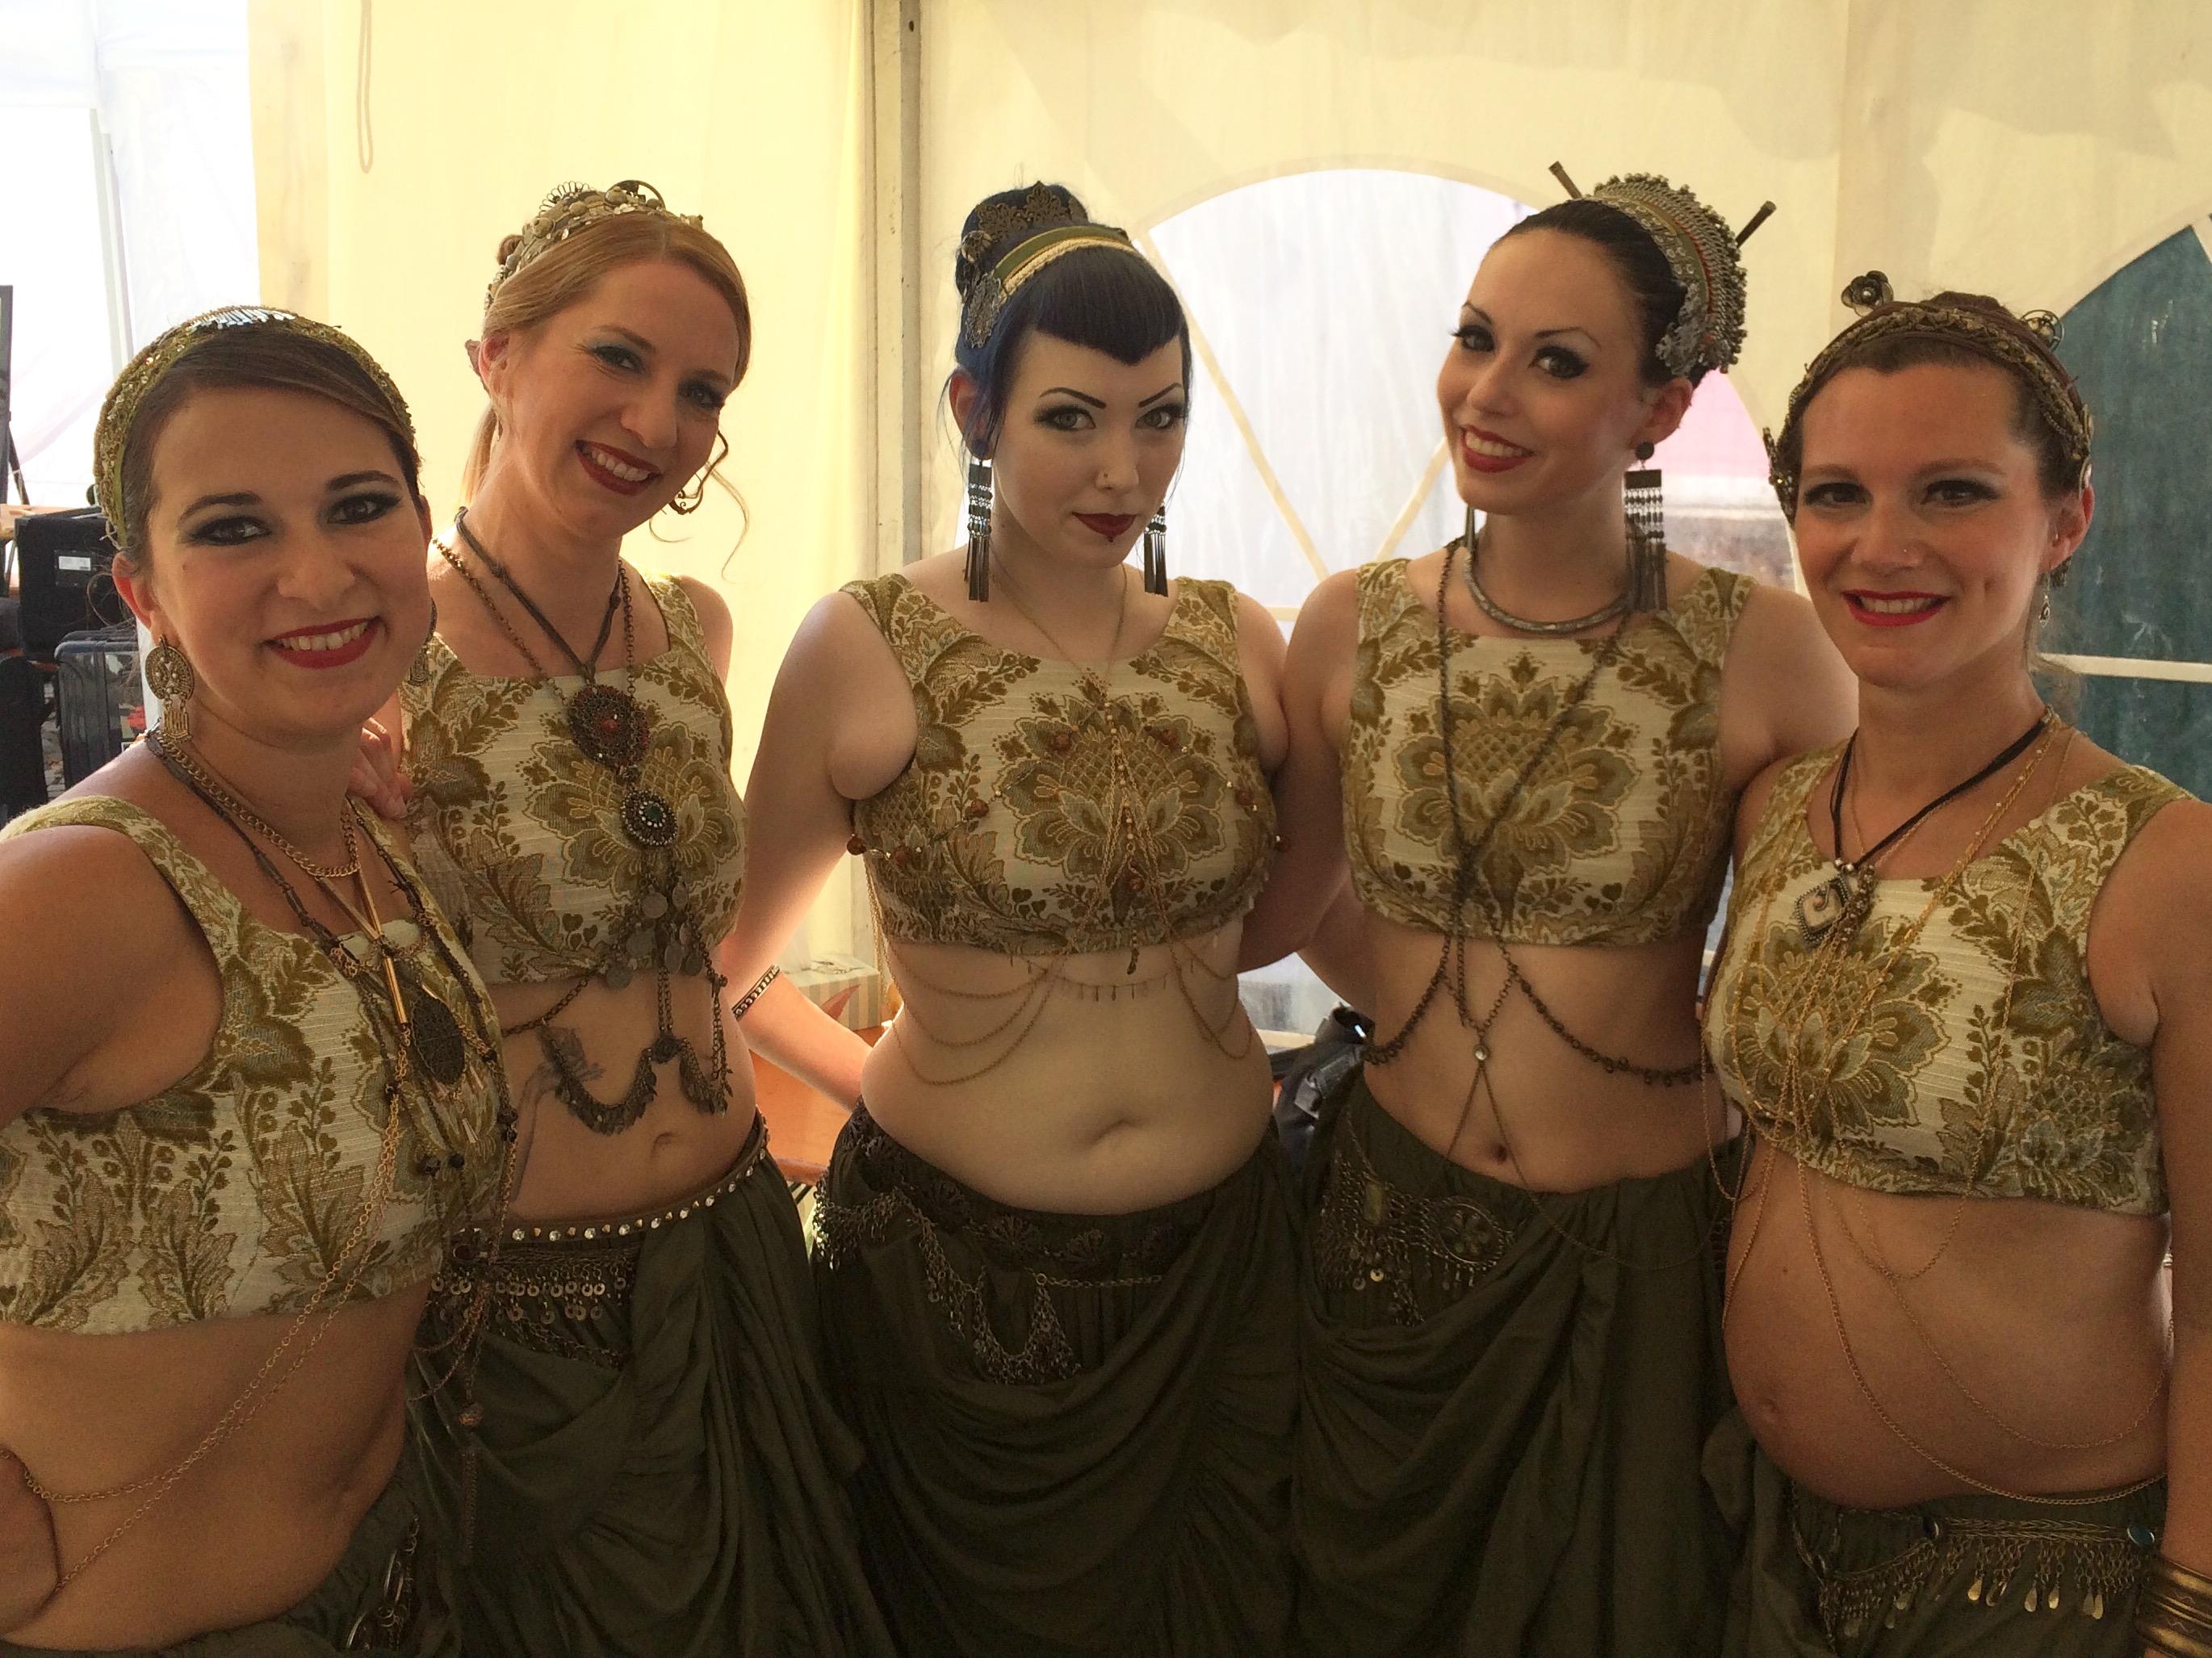 Fest der Kulturen 2016 & Perlatentia